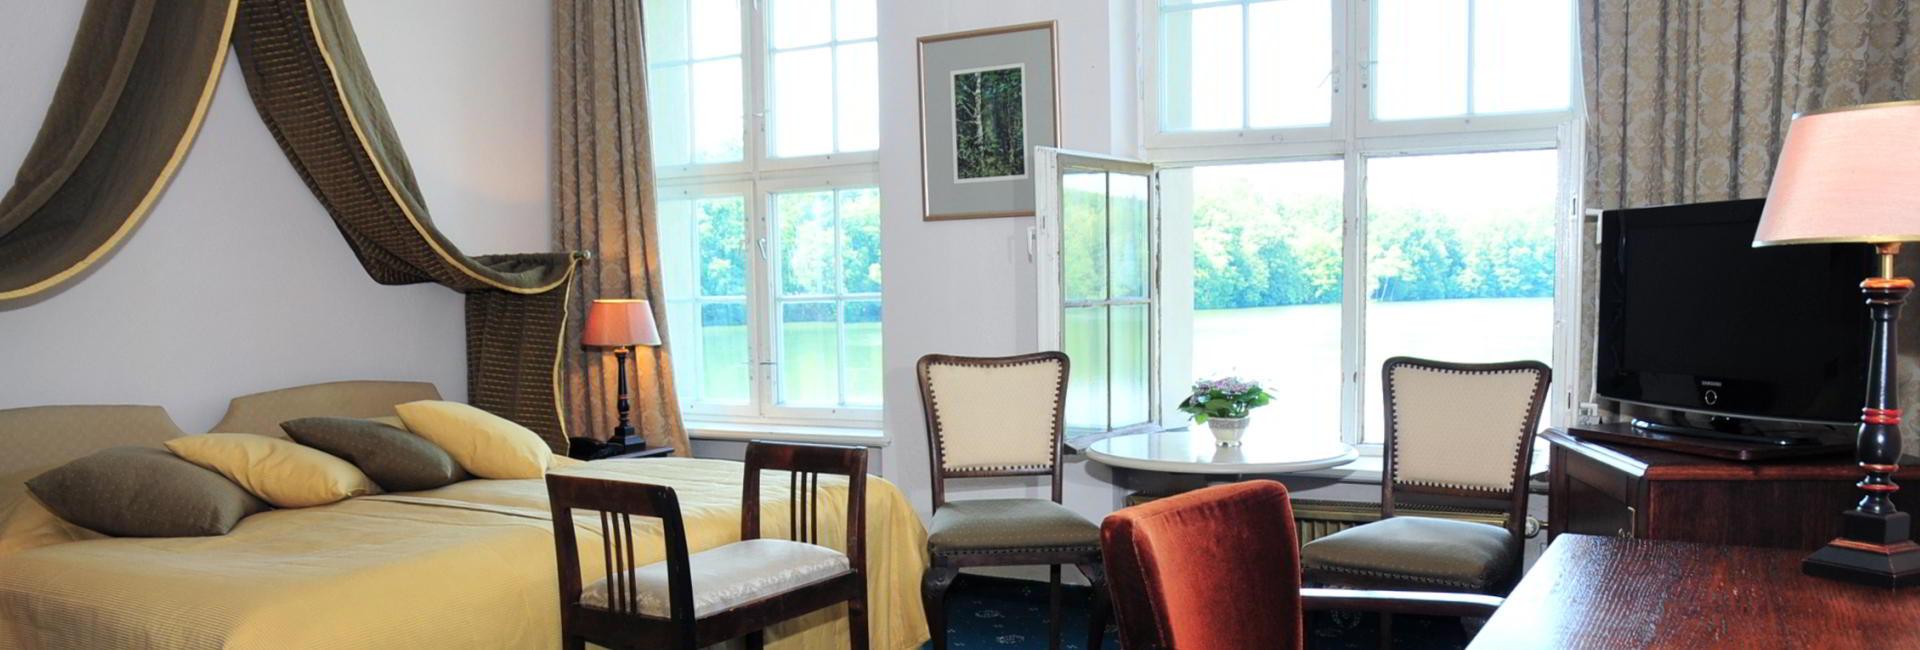 Apartment at Castle Hotel Podewils in Krag, Poland